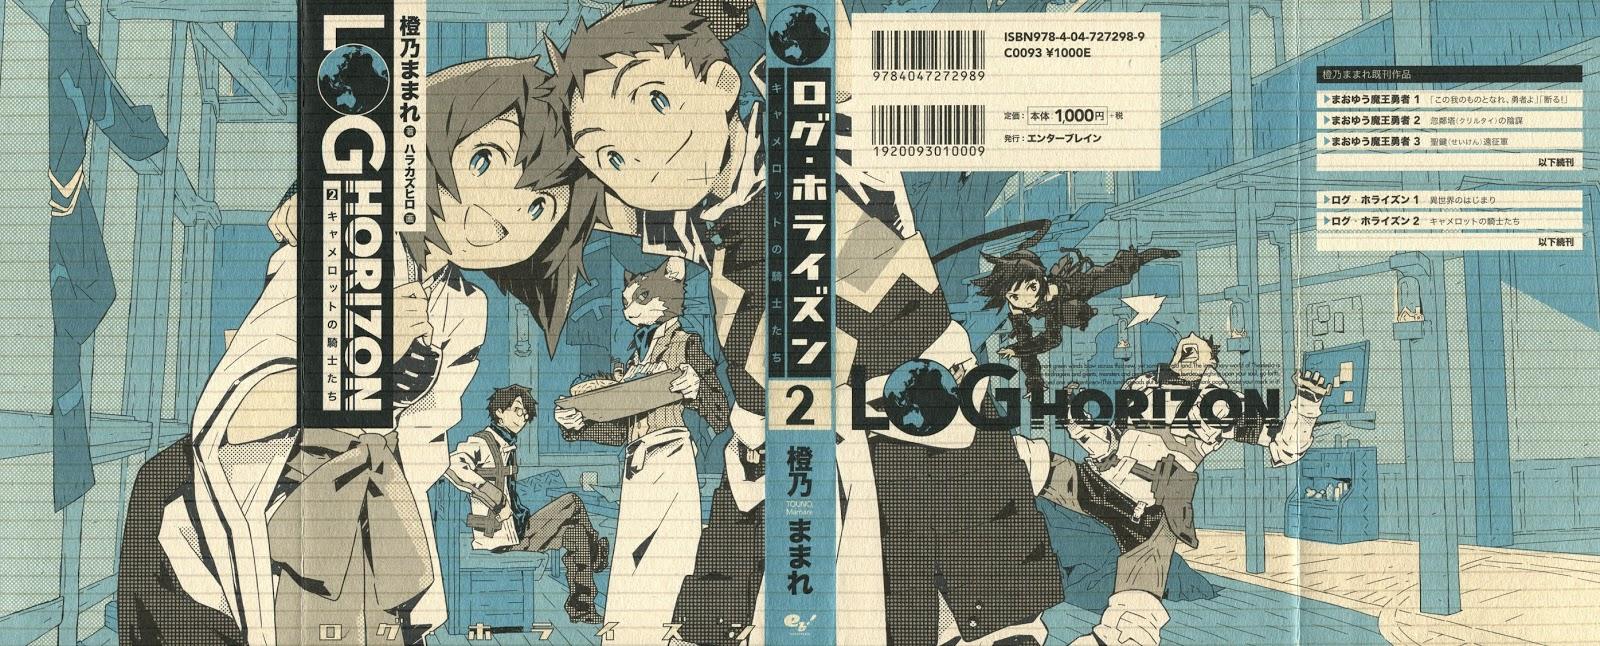 Anime, Fan Fiction And Books Oh My! Log Horizon, Volume 2